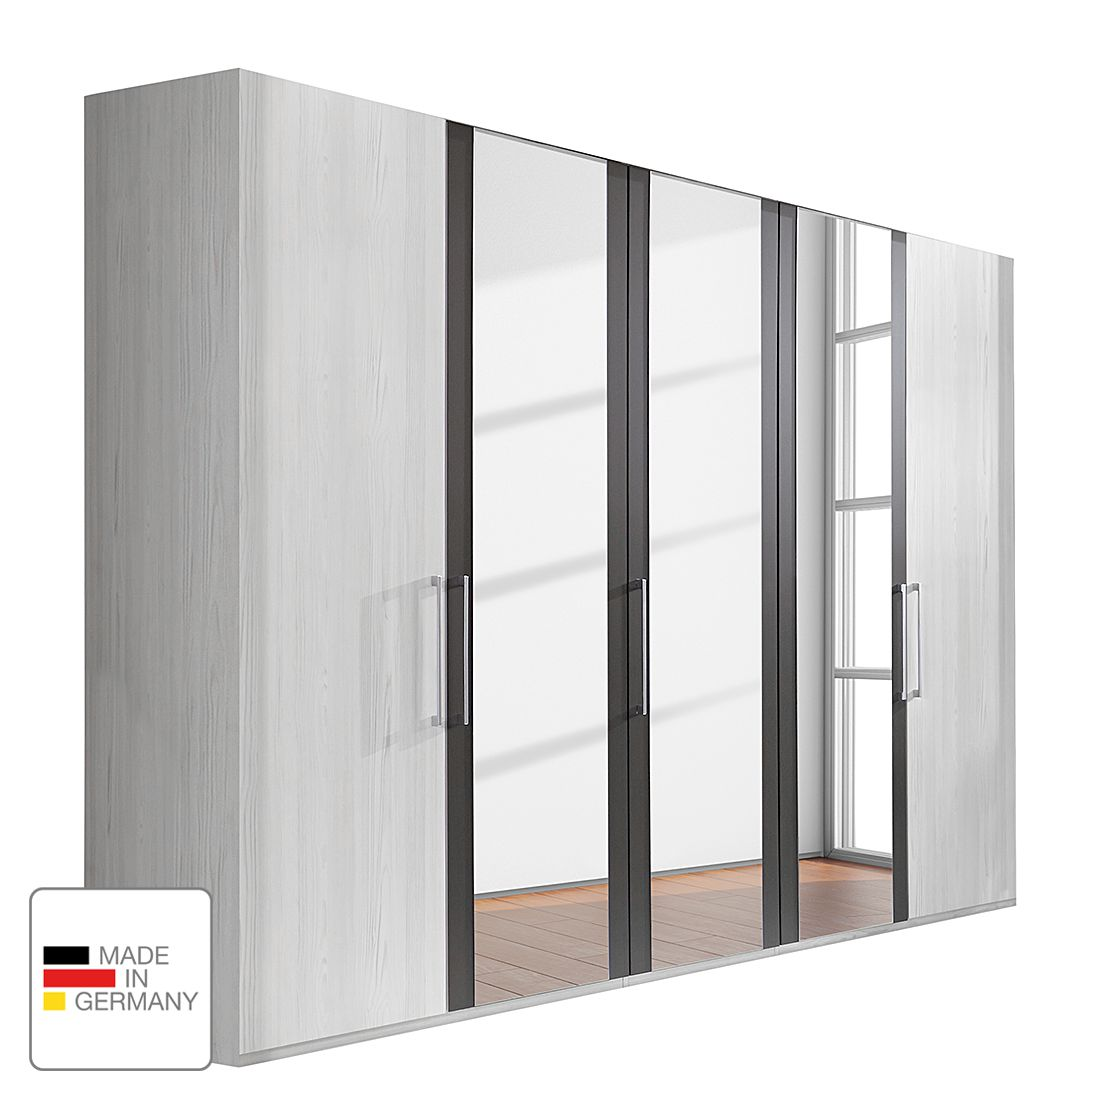 Mobistoxx miroir cricket meleze sable beton prix et offres for Porte miroir 50 cm